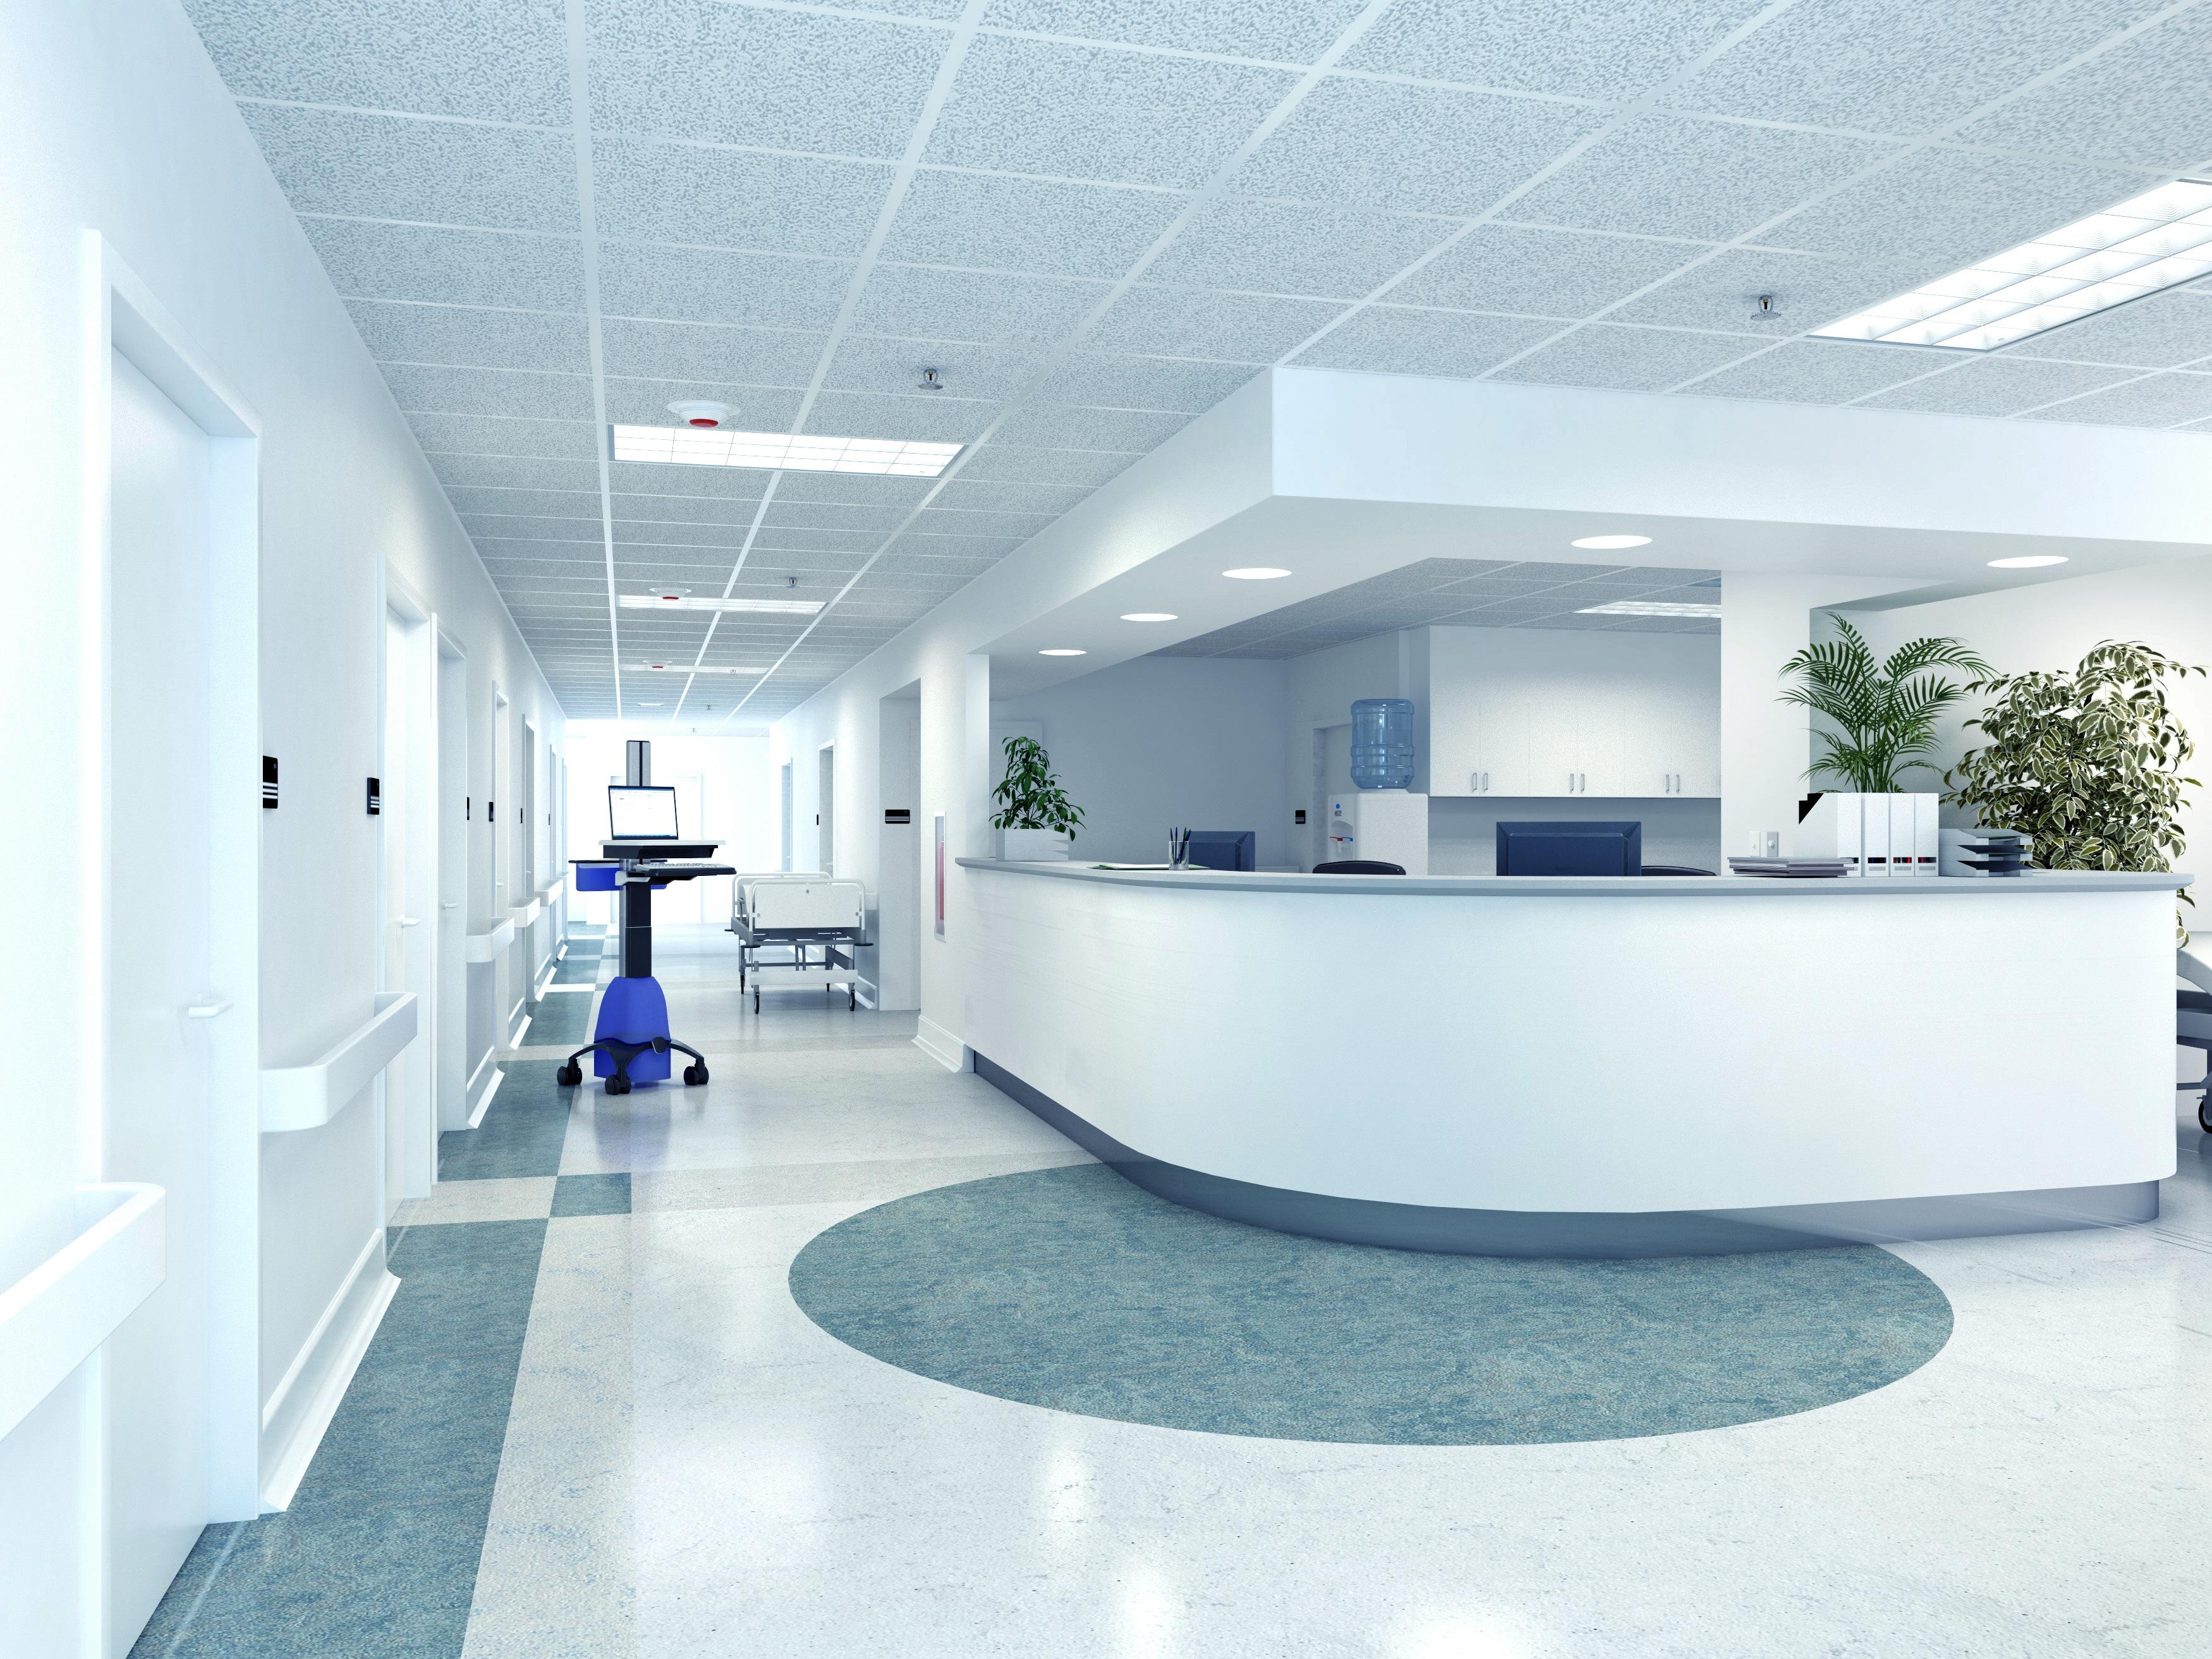 Building_Automation_-_Critical_Care_-_Nurse_Station.jpg